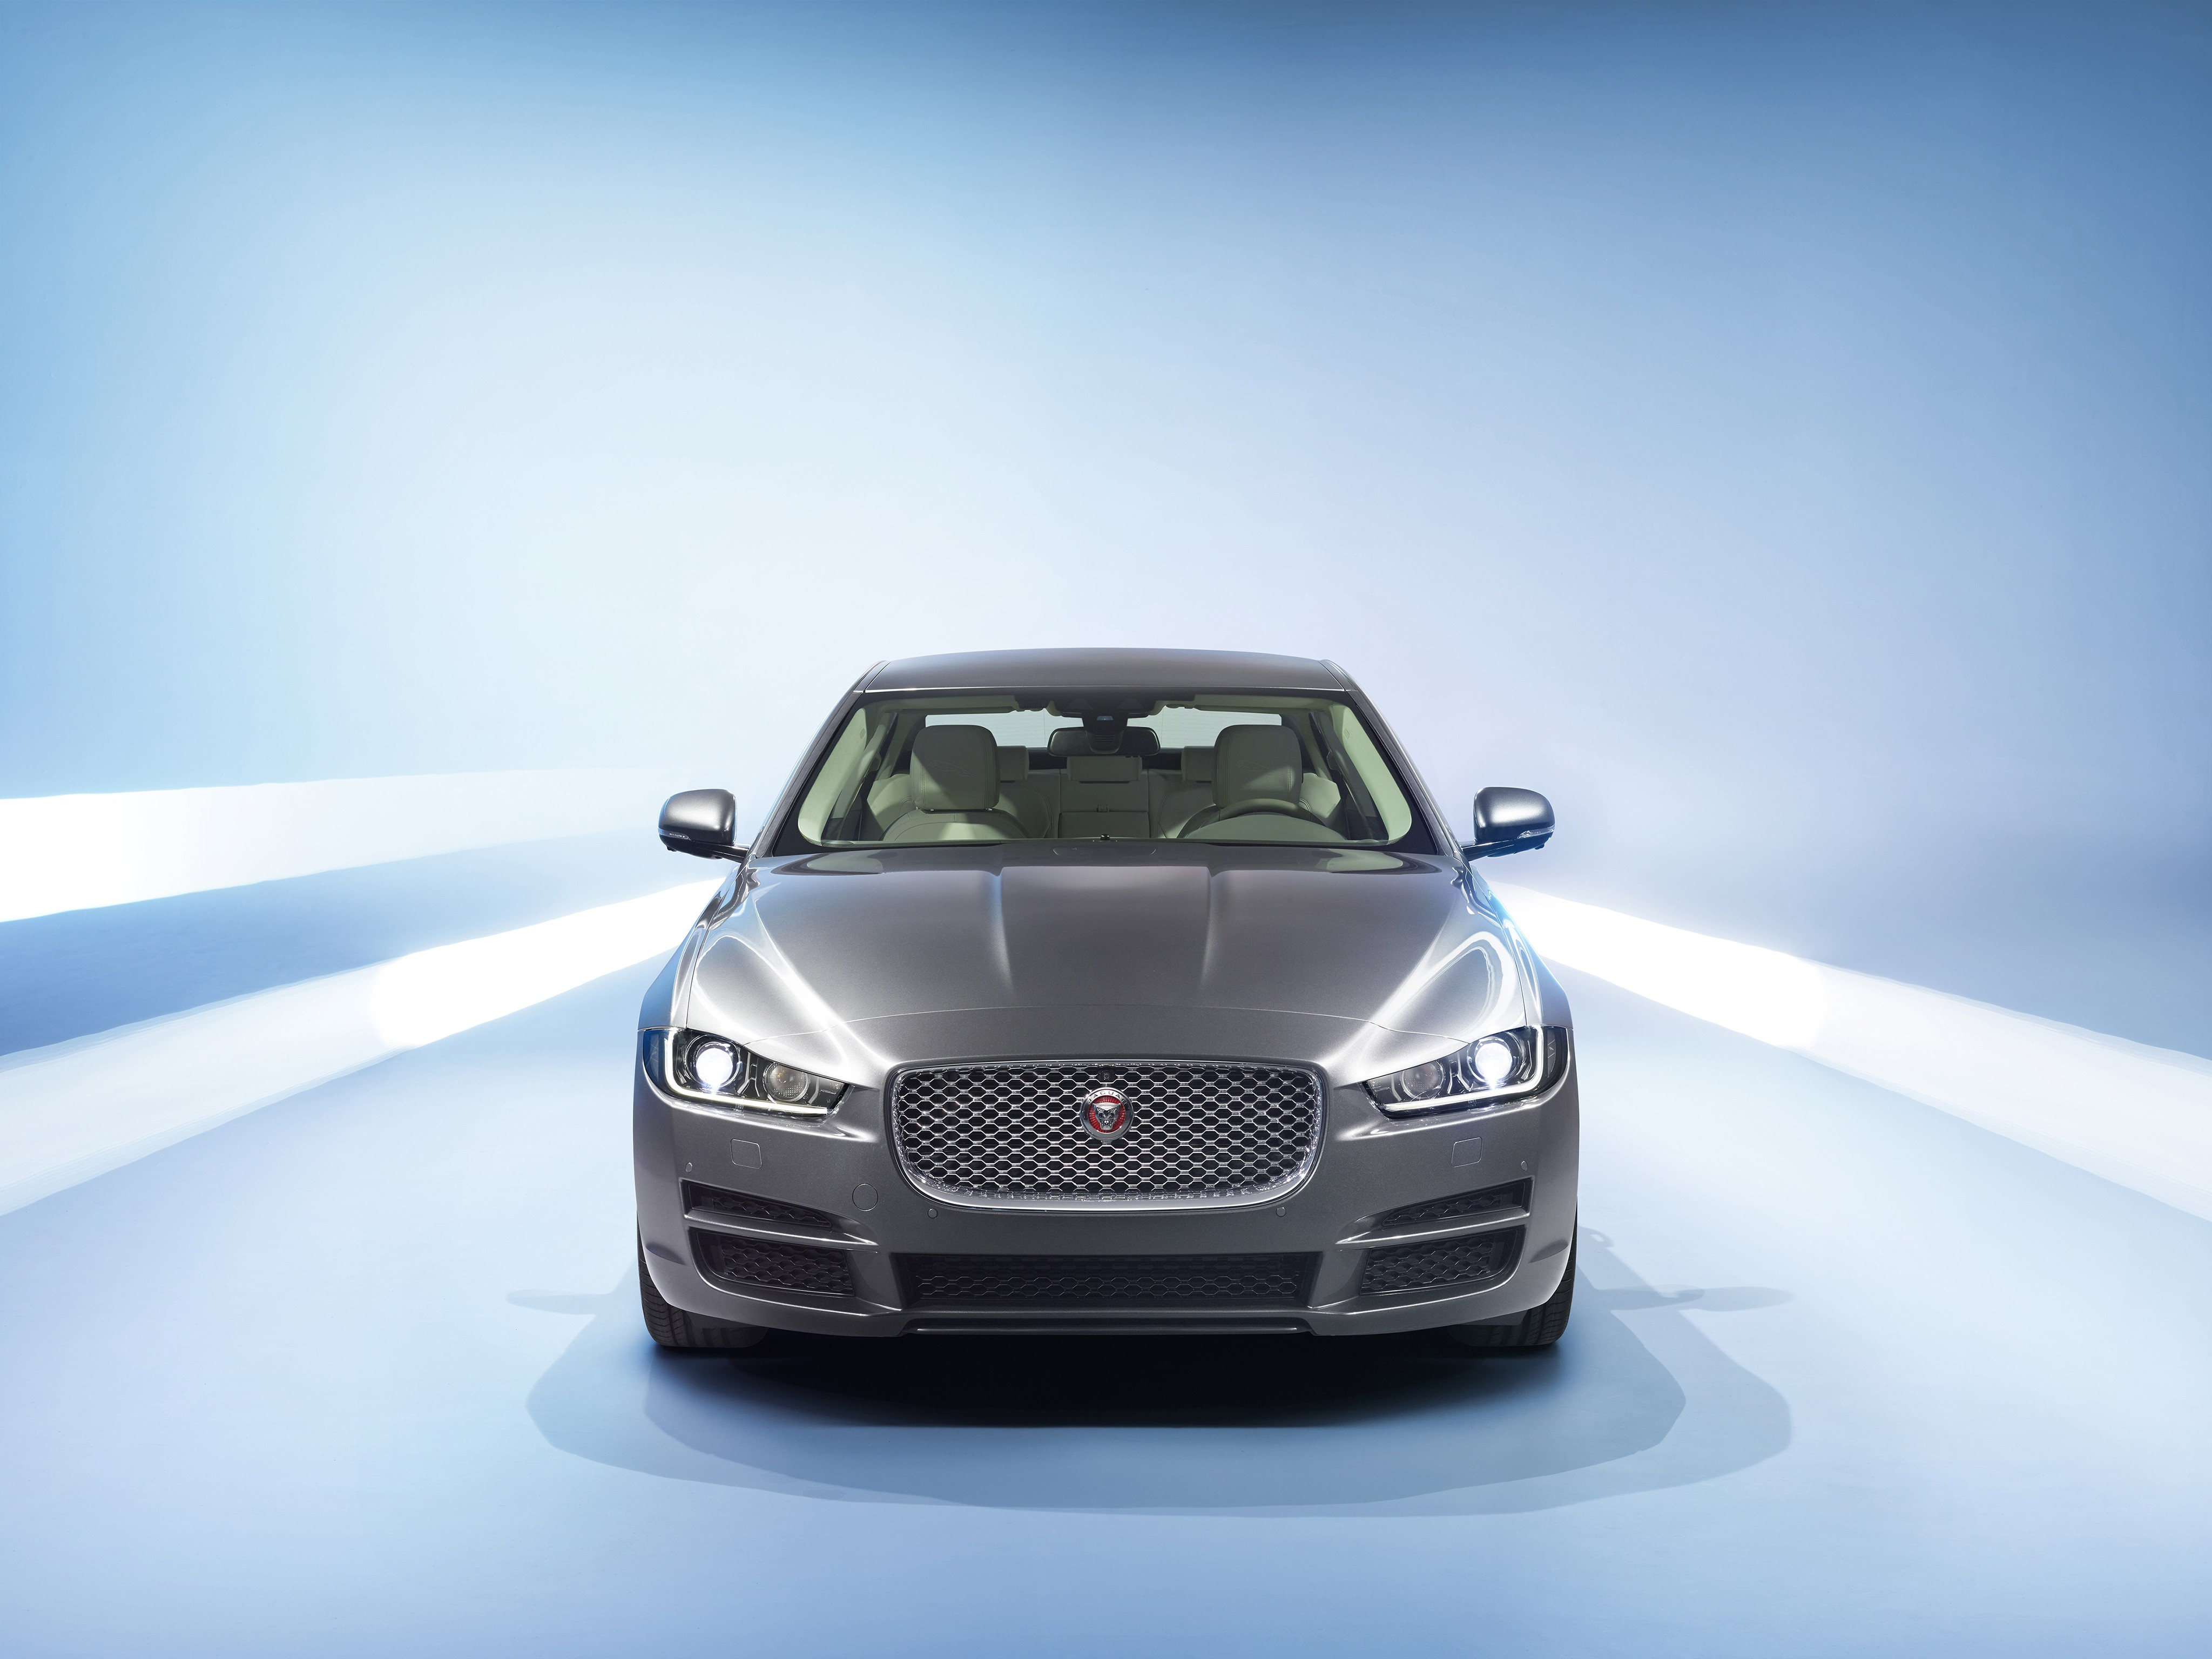 jag class blog car carwow series c jaguar comparison range mercedes and bmw specification xe image dimensions includes guide